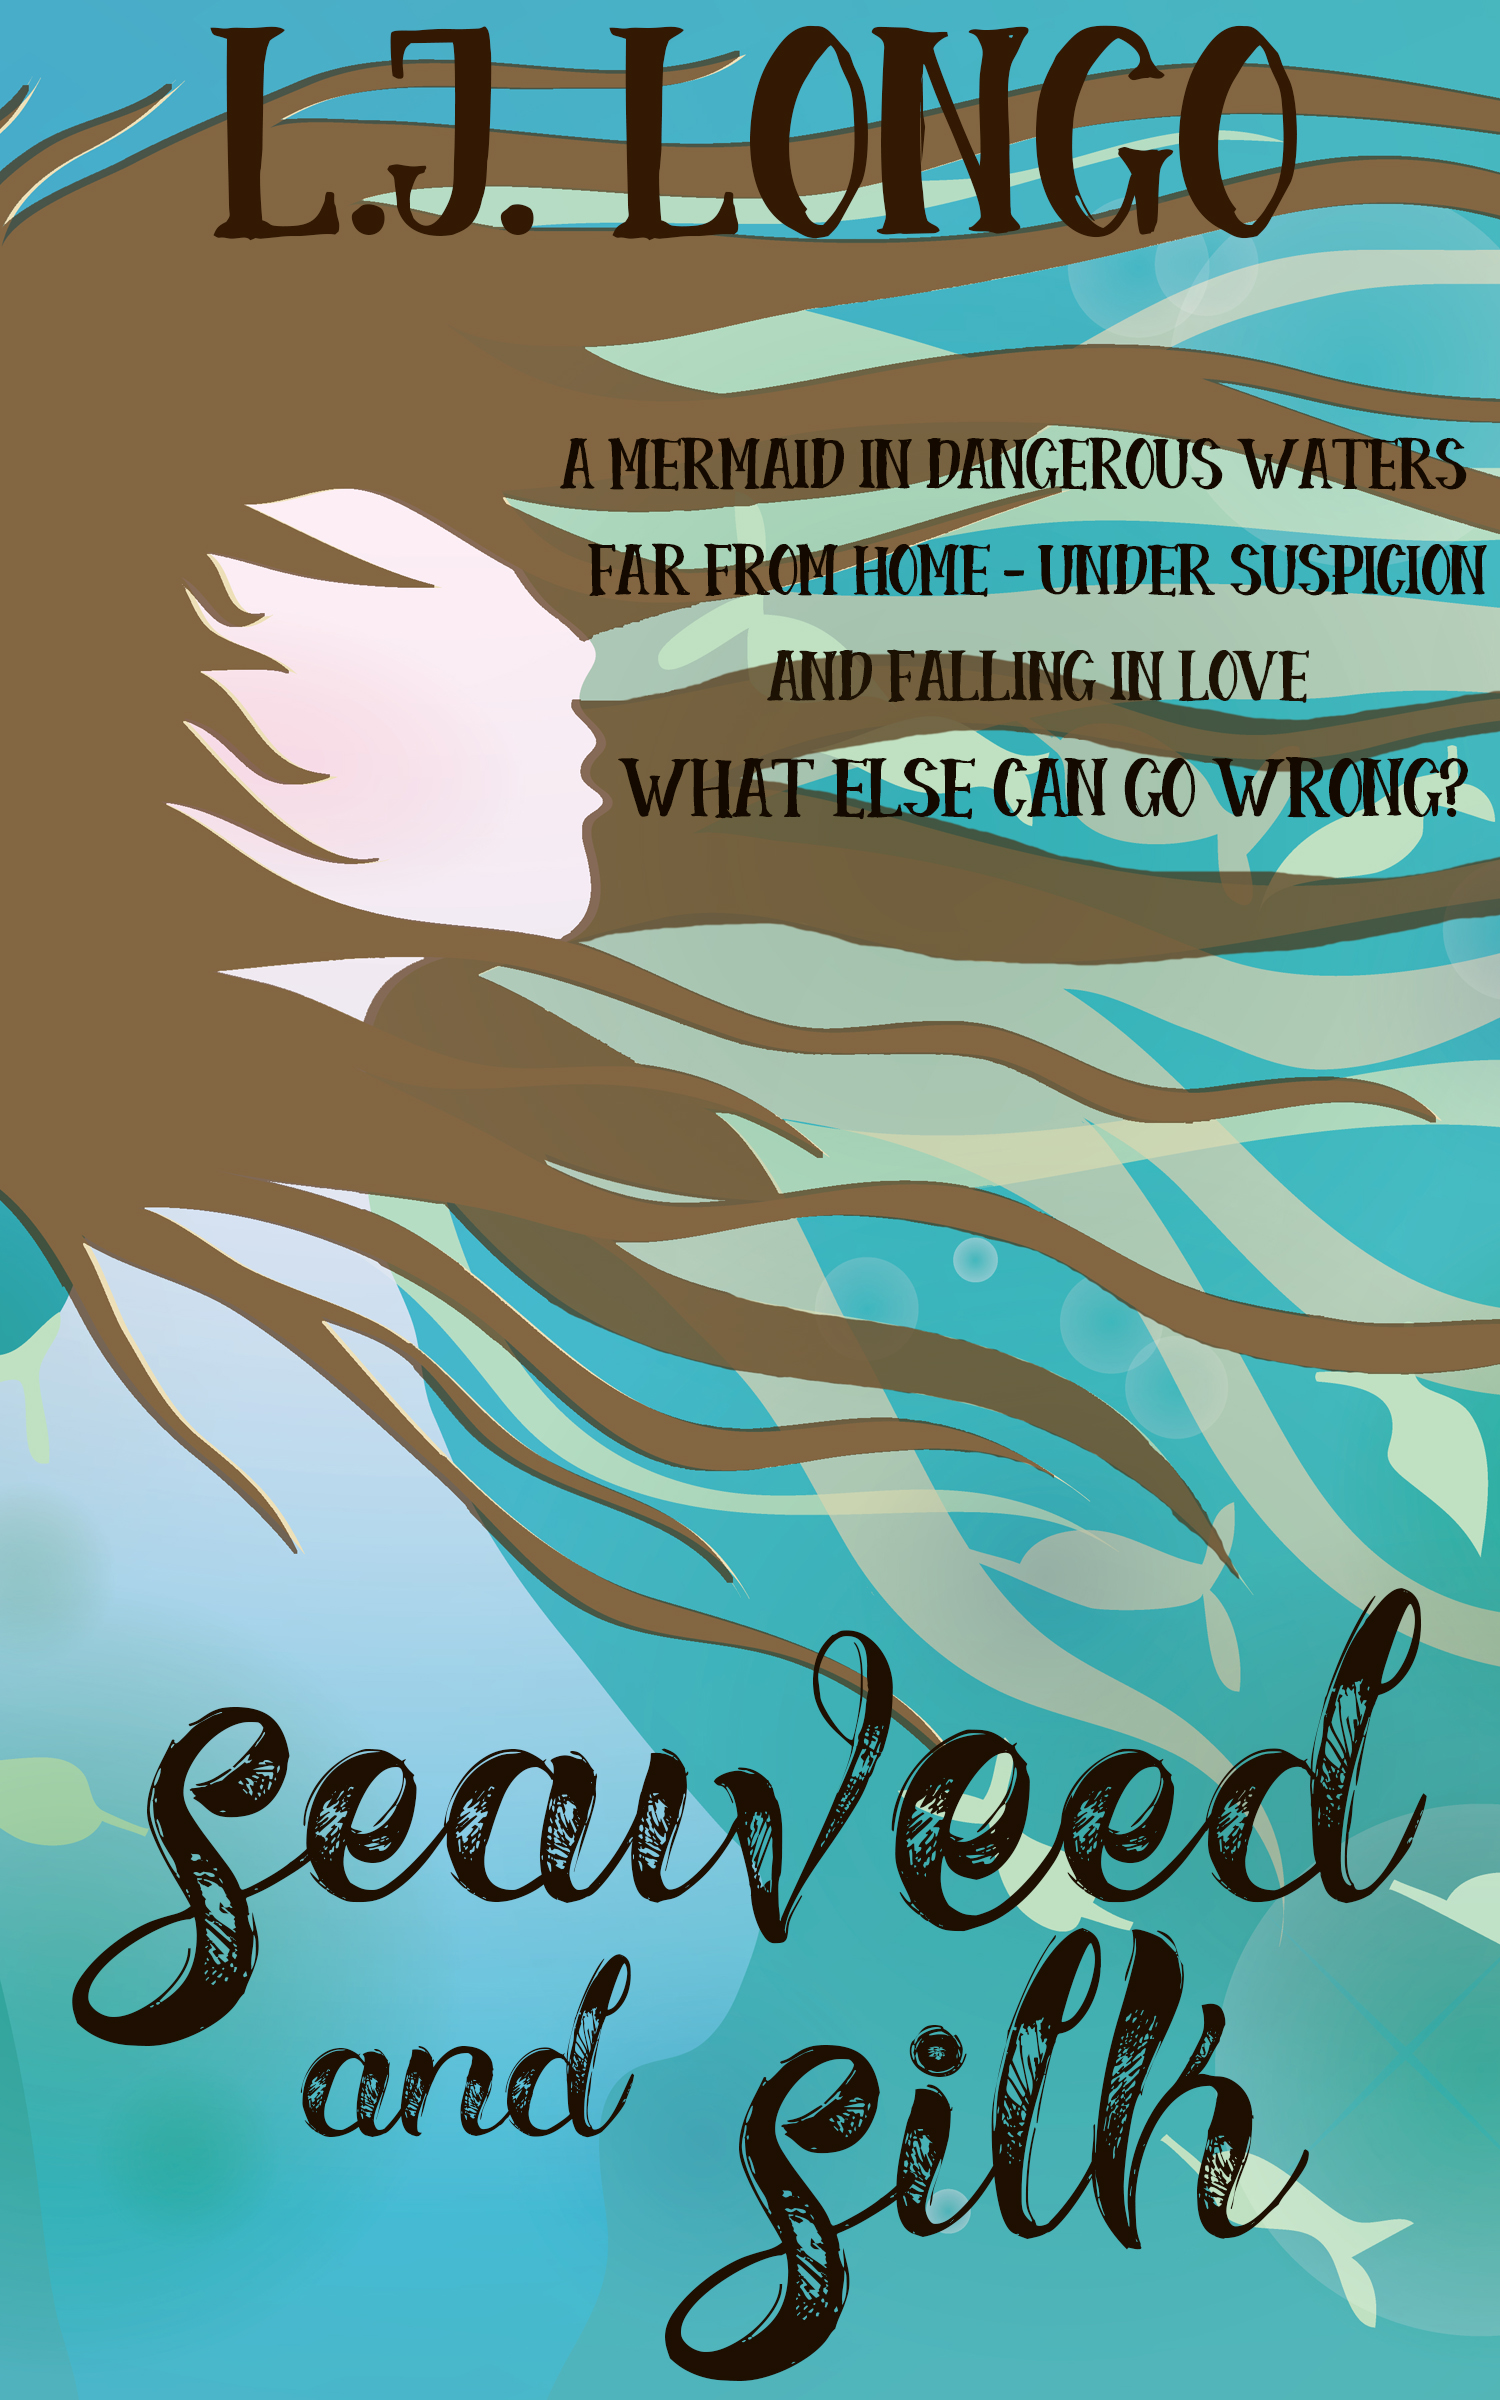 Seaweed and Silk